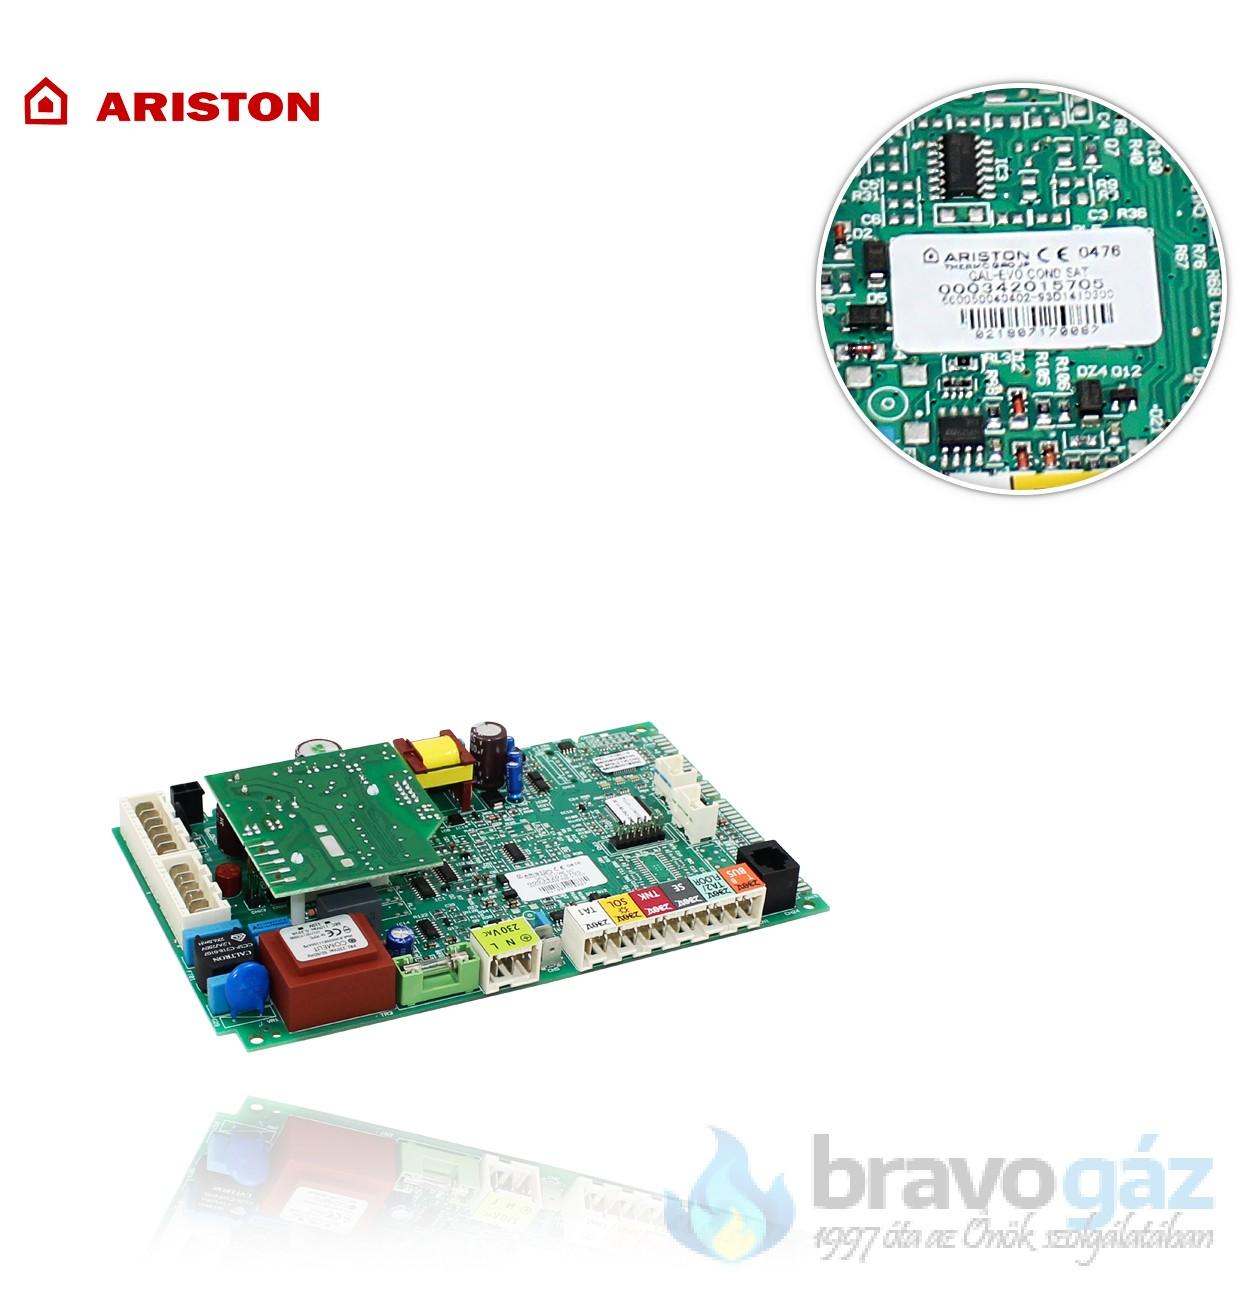 Ariston vezérlő panel - 60001898-04